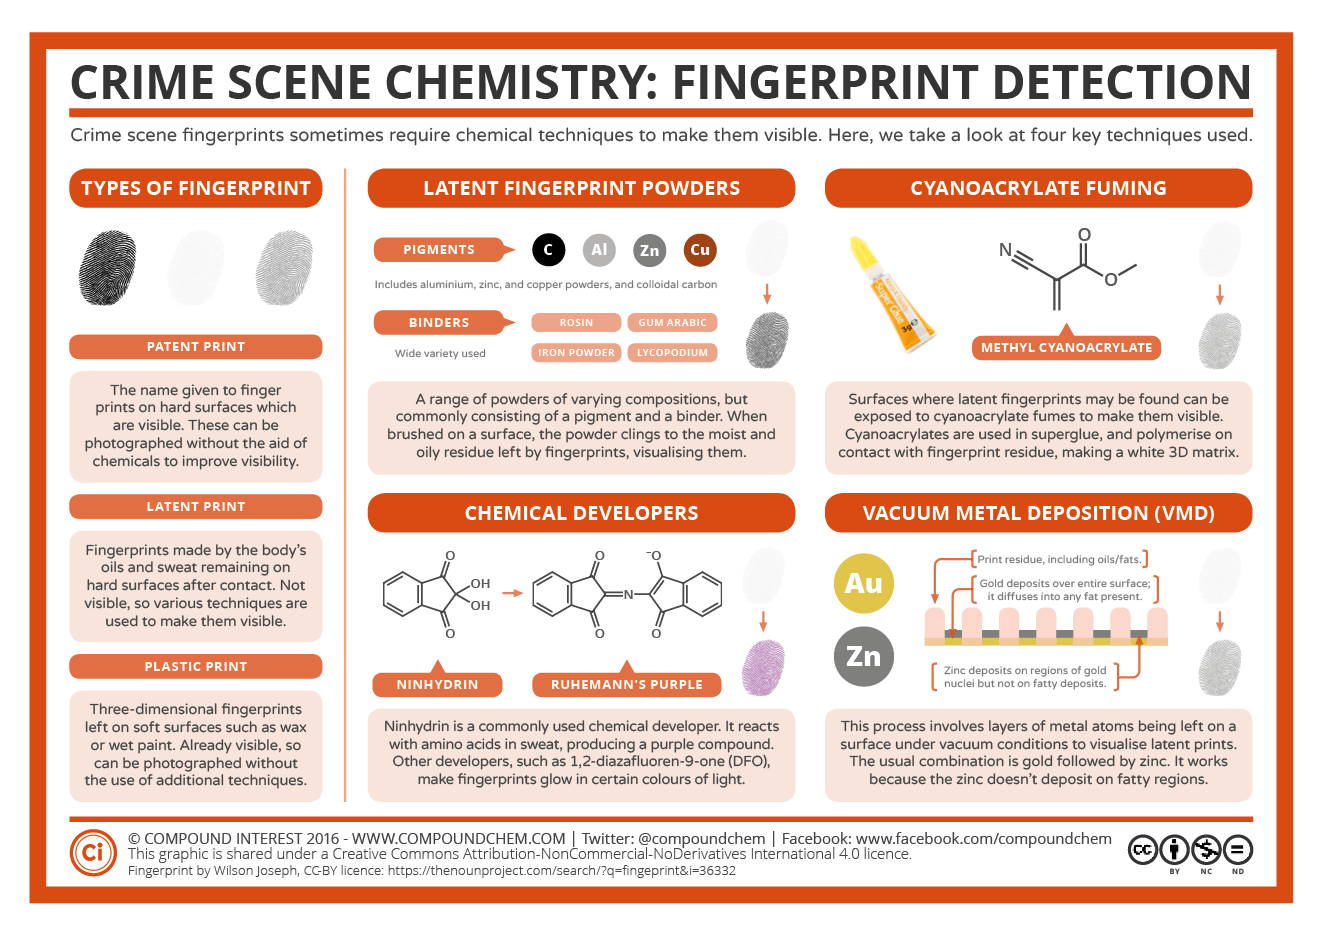 Crime Scene Chemistry – Fingerprint Detection | Compound Interest